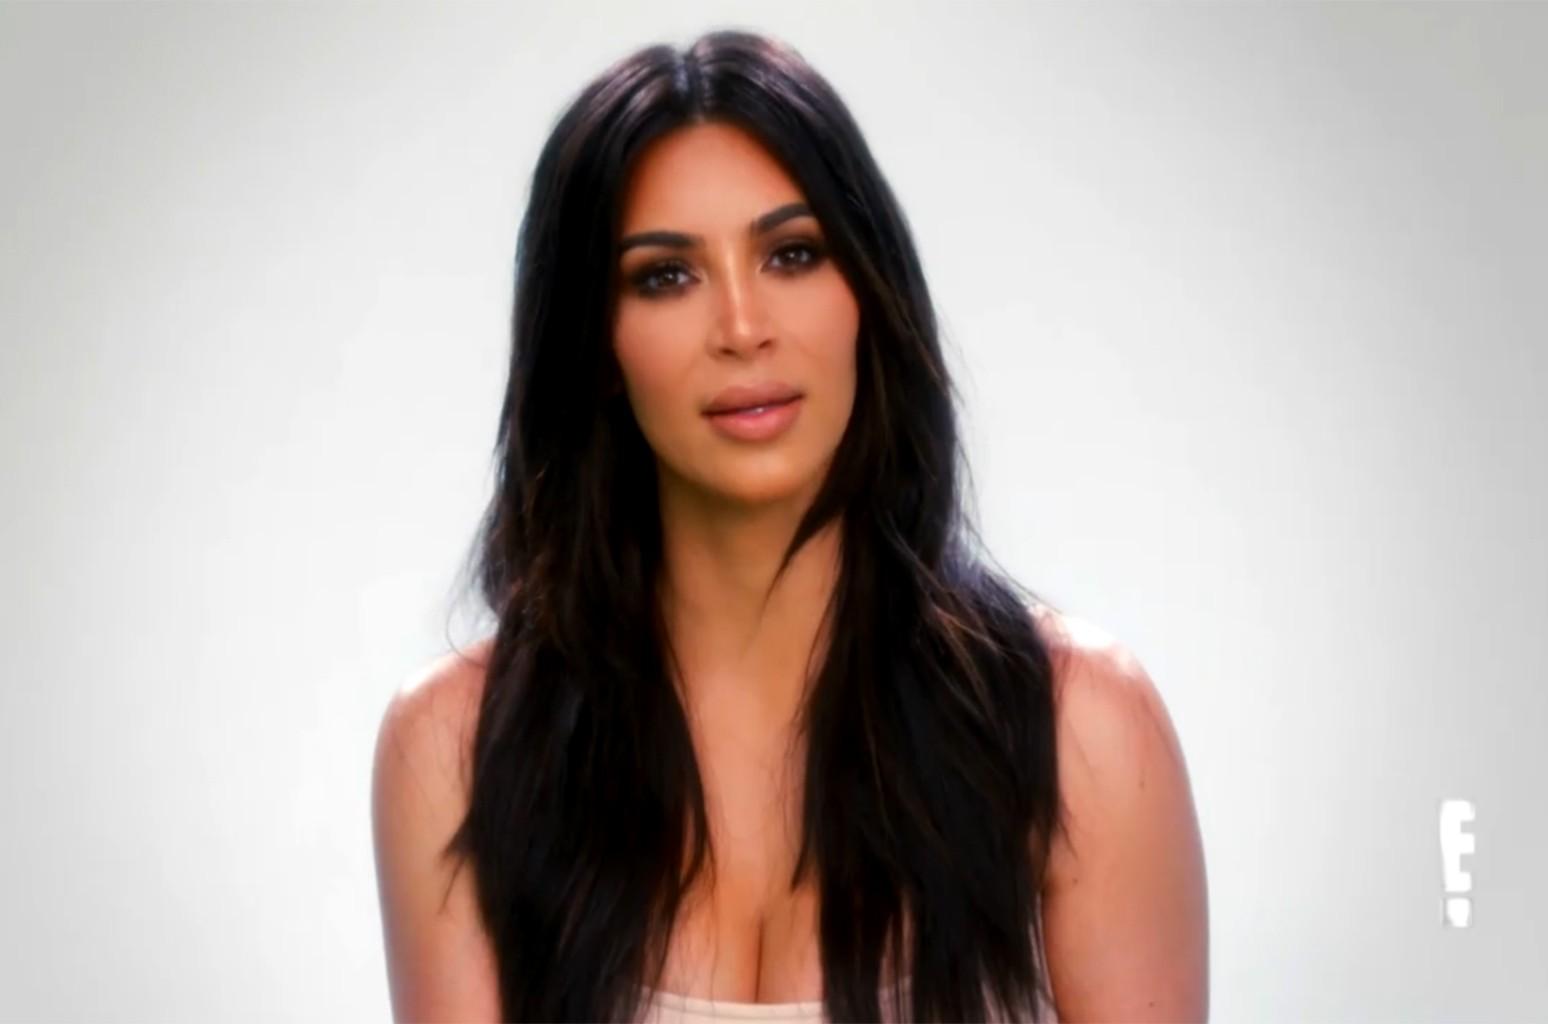 Kim Kardashian on Keeping Up With the Kardashians.